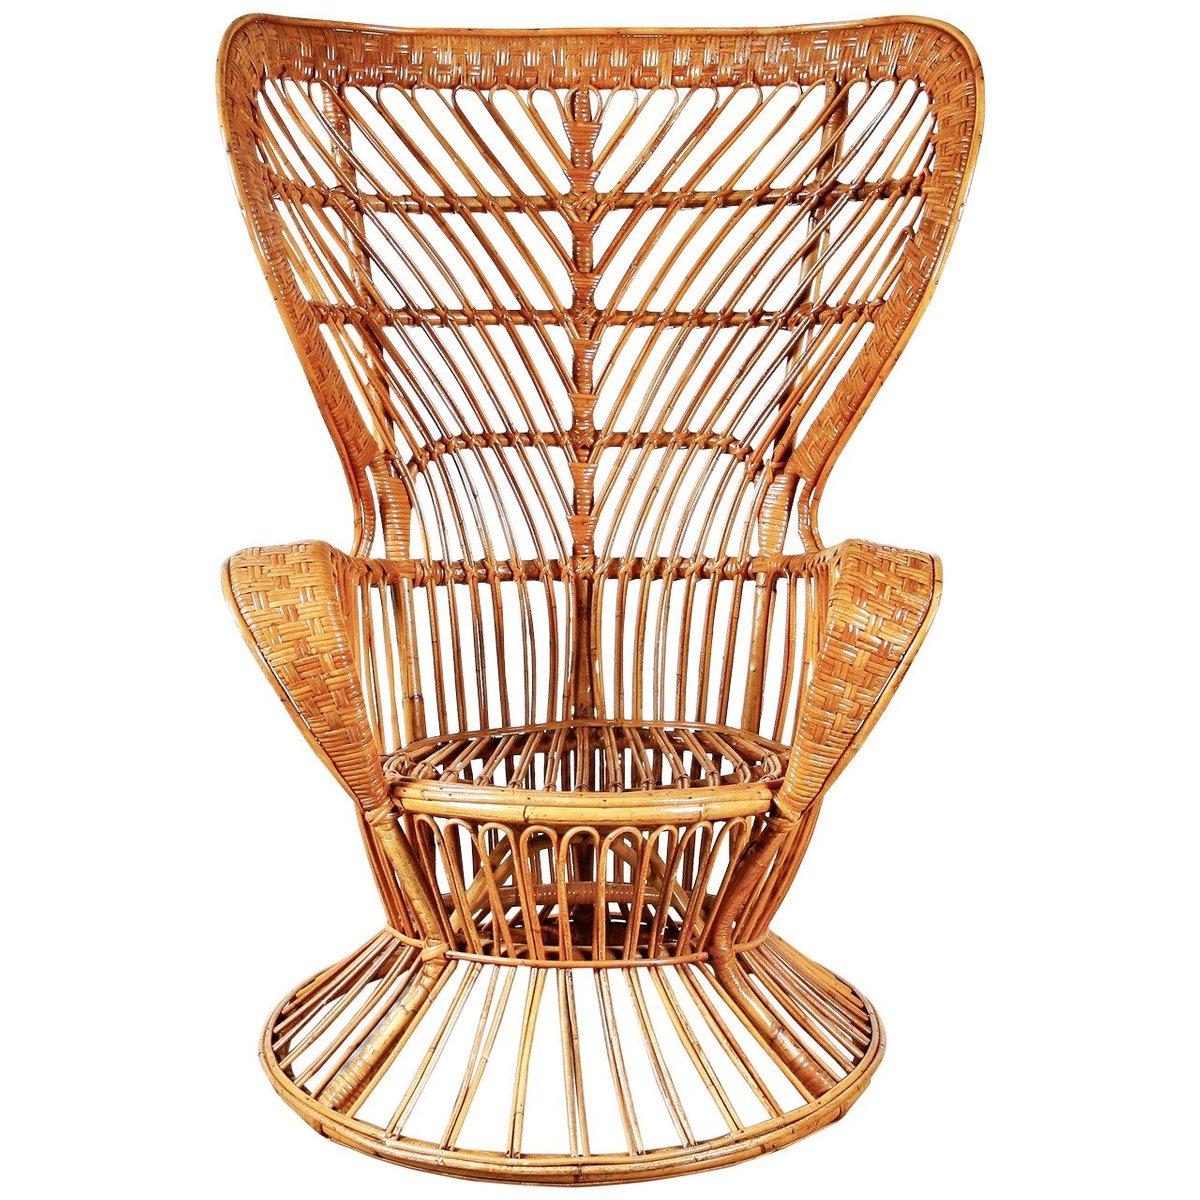 pierantonio bonacina rattansessel online kaufen m bel suchmaschine. Black Bedroom Furniture Sets. Home Design Ideas